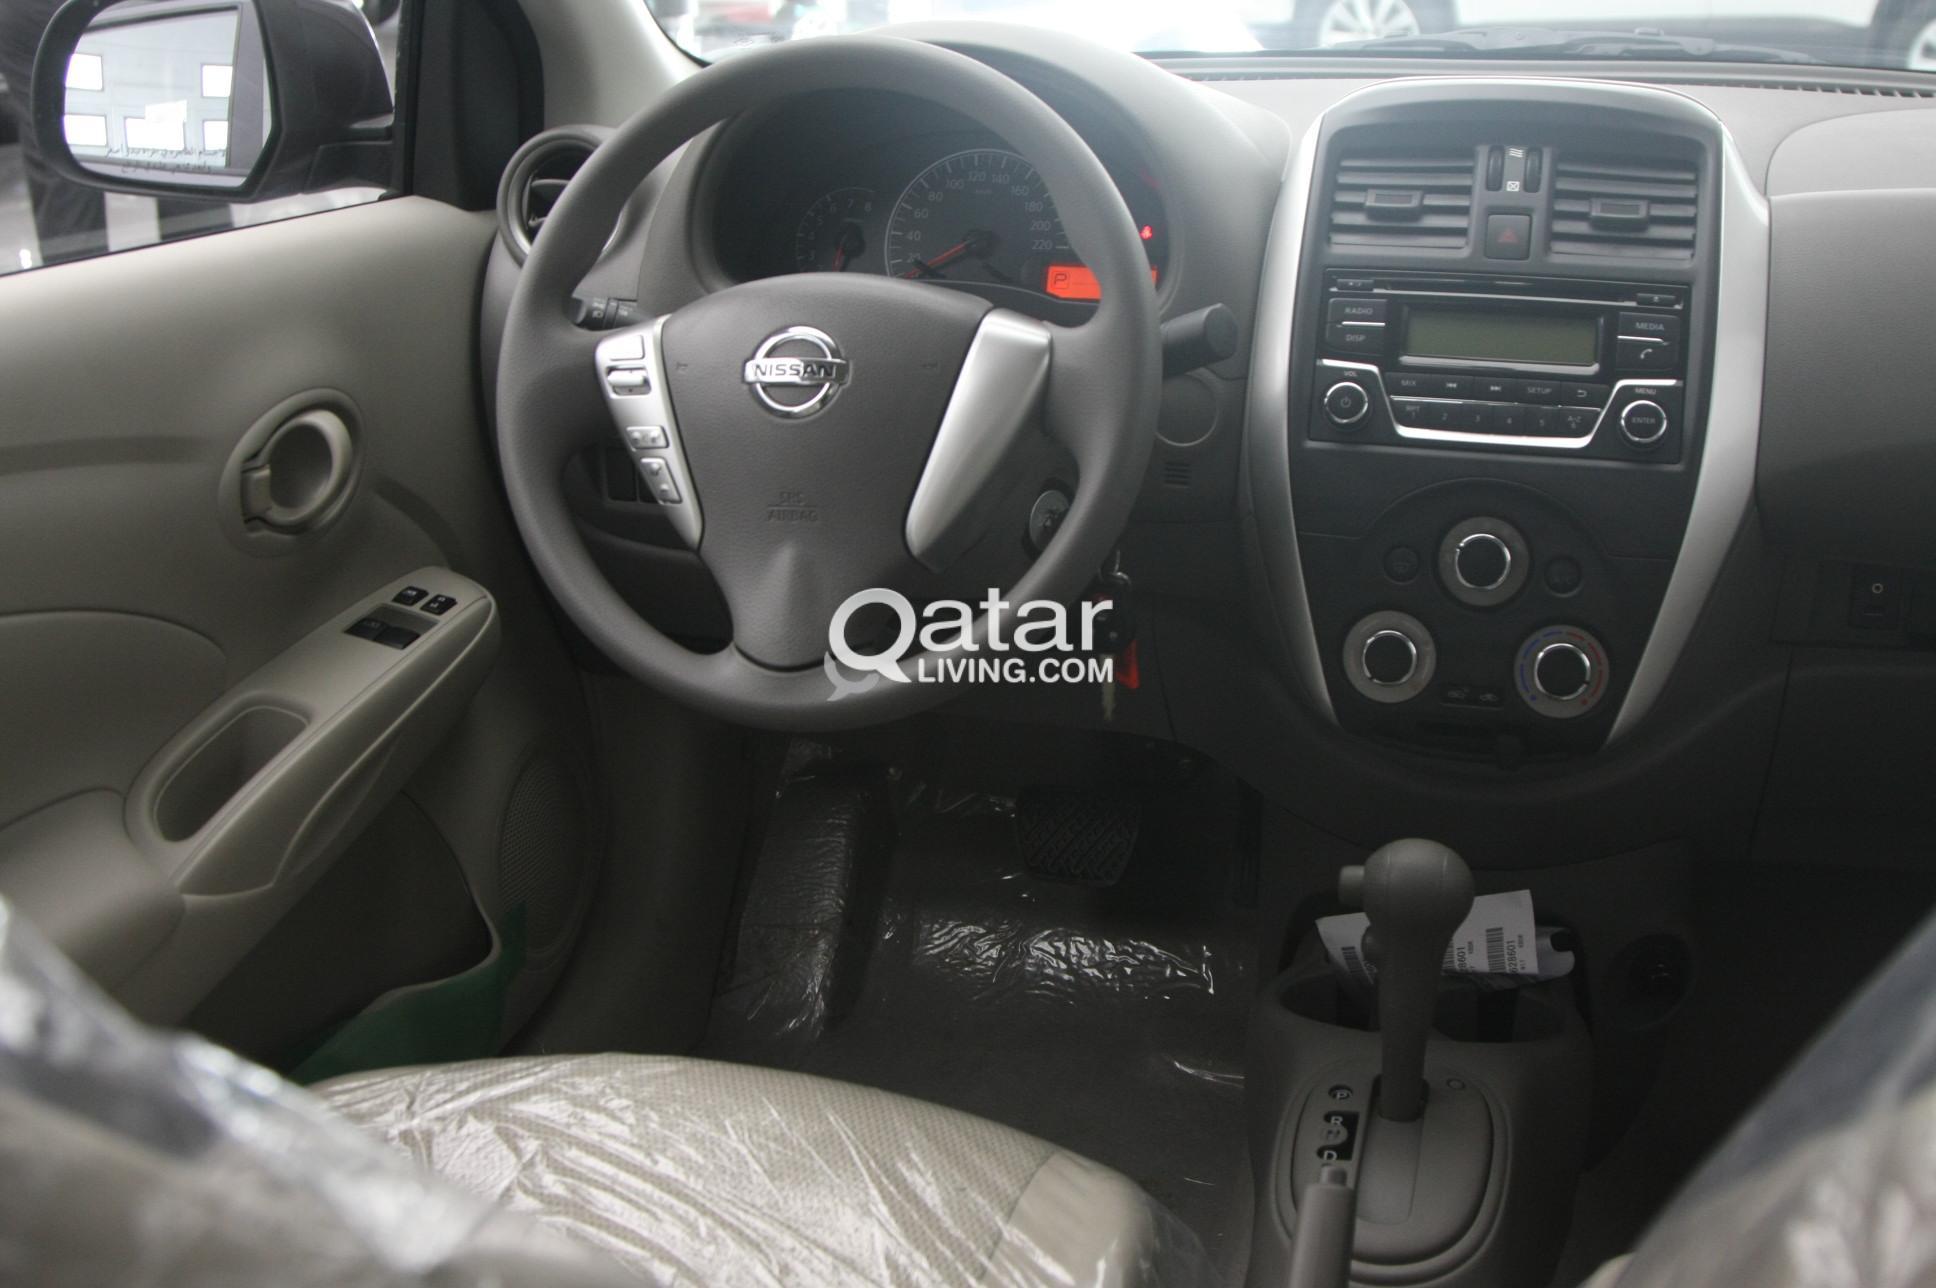 Nissan Sunny 2018 | Qatar Living